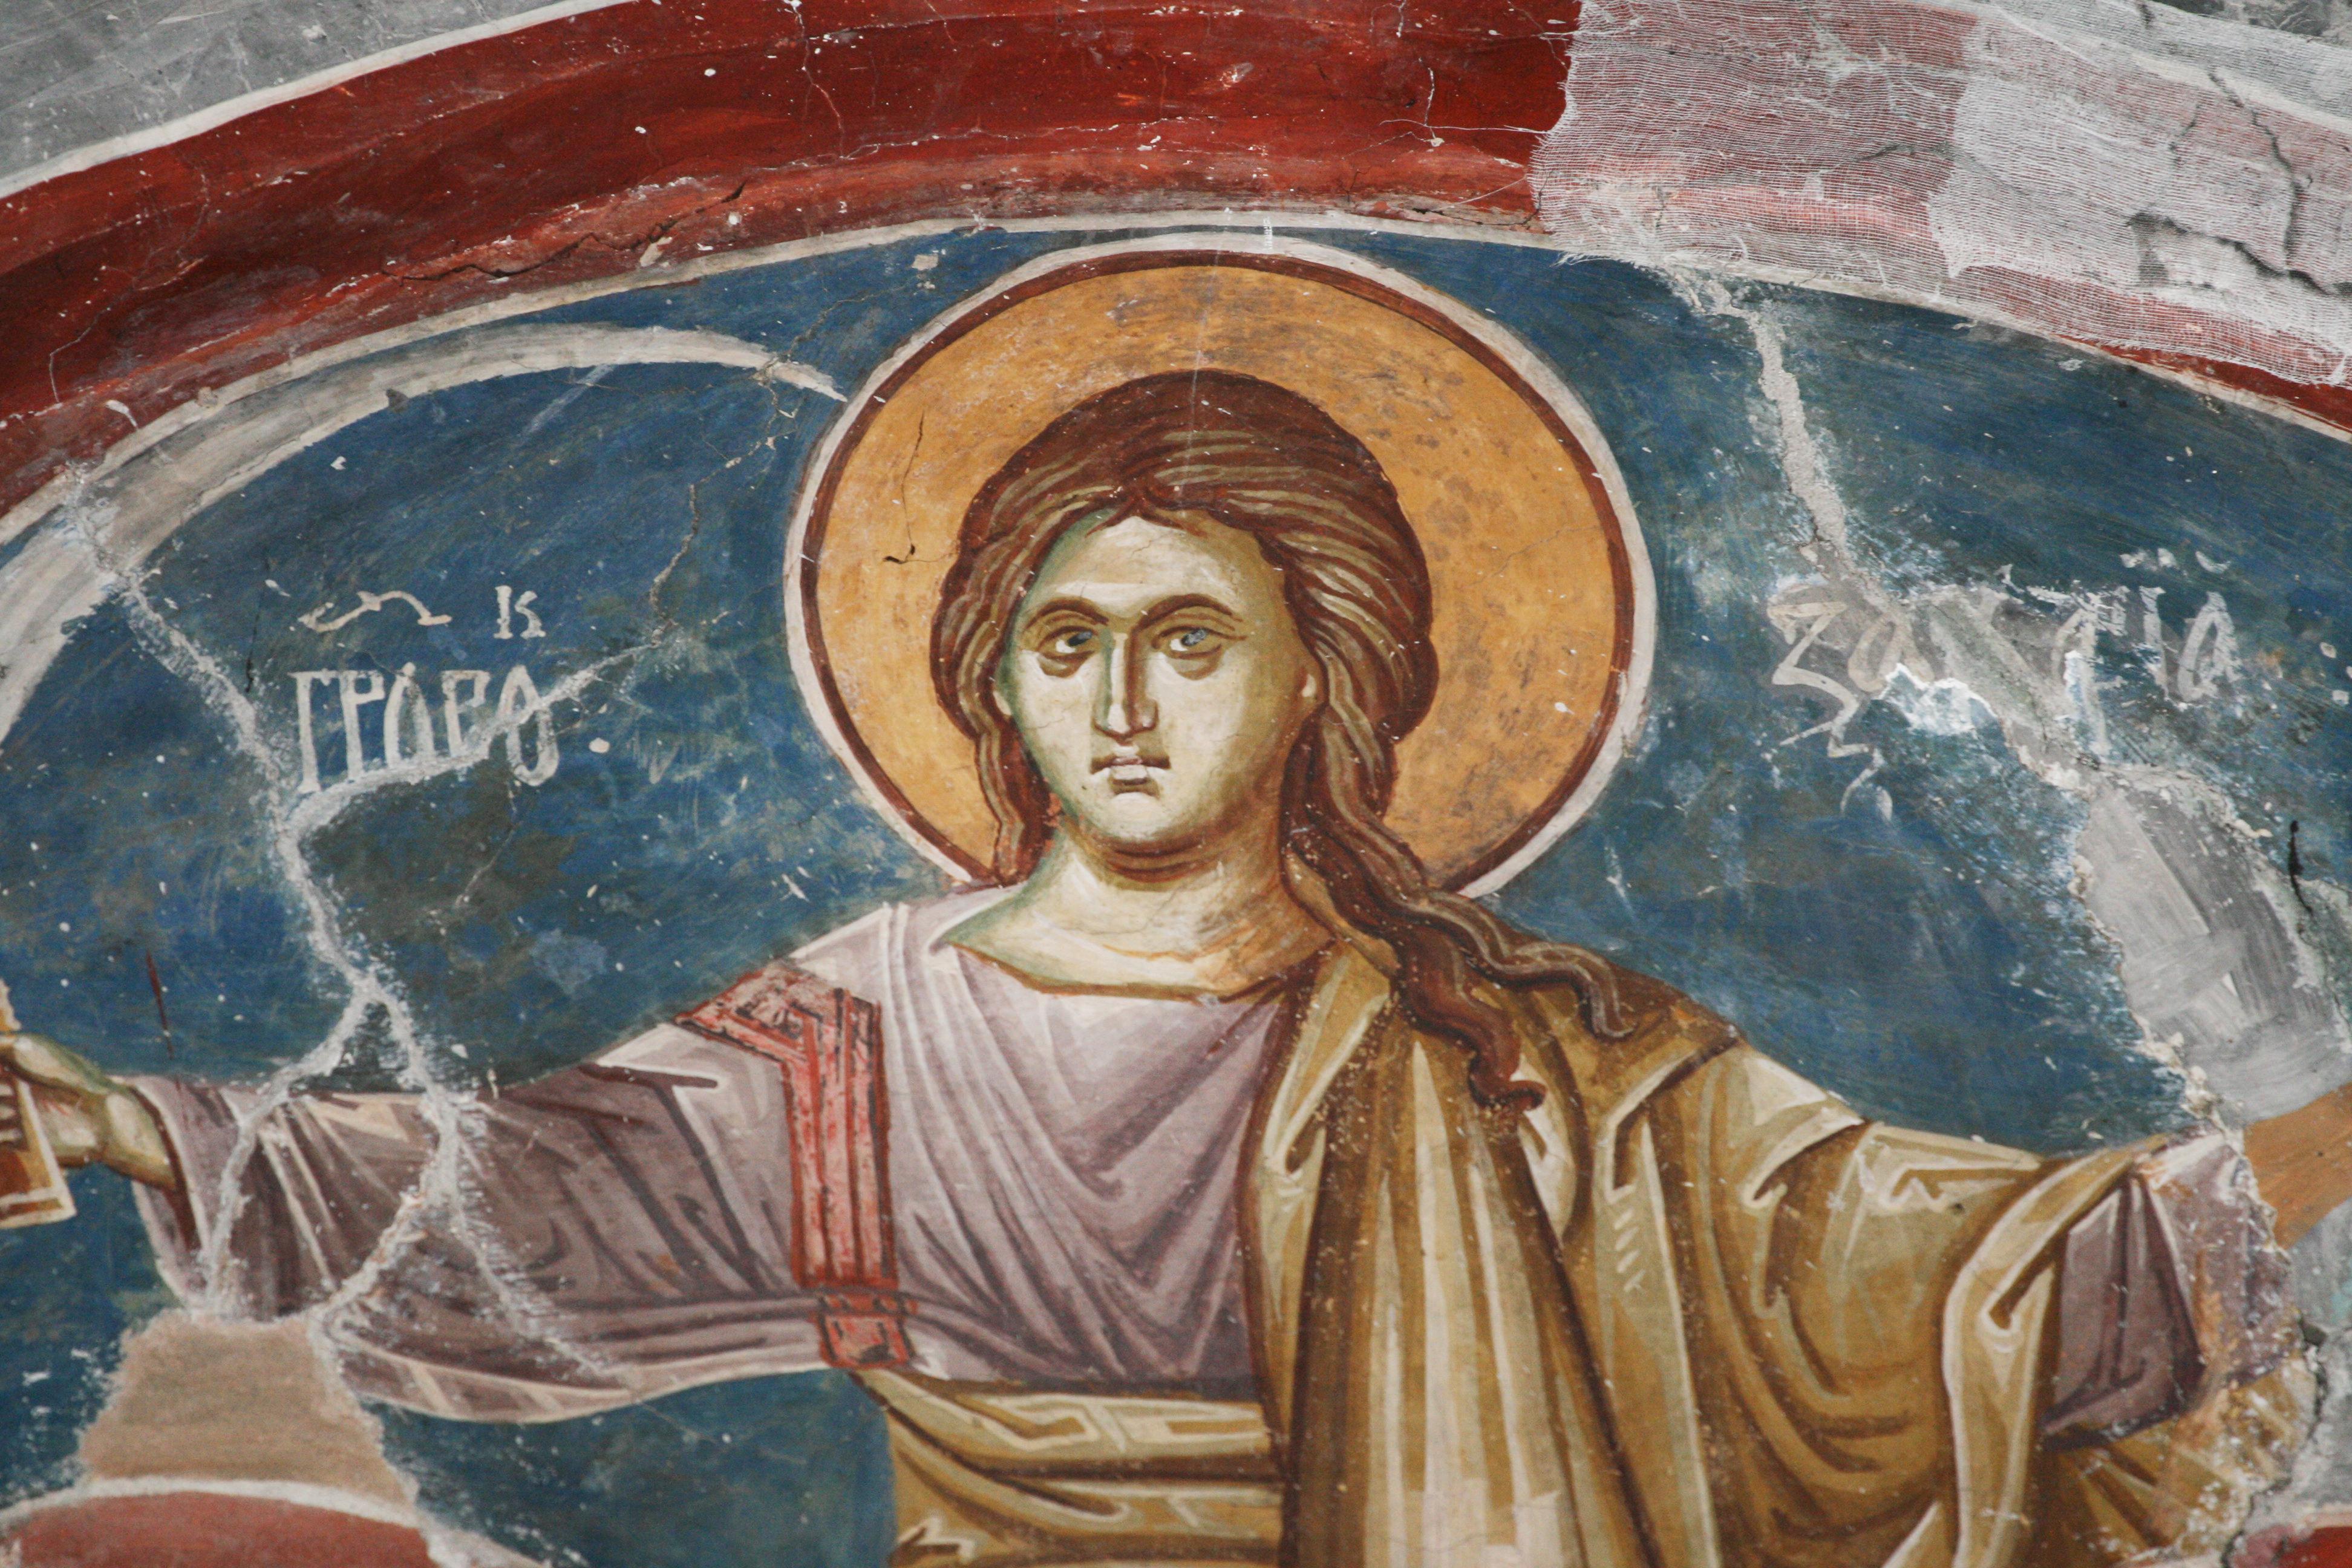 21 февраля 2020 отмечается праздник Захар Серповидец